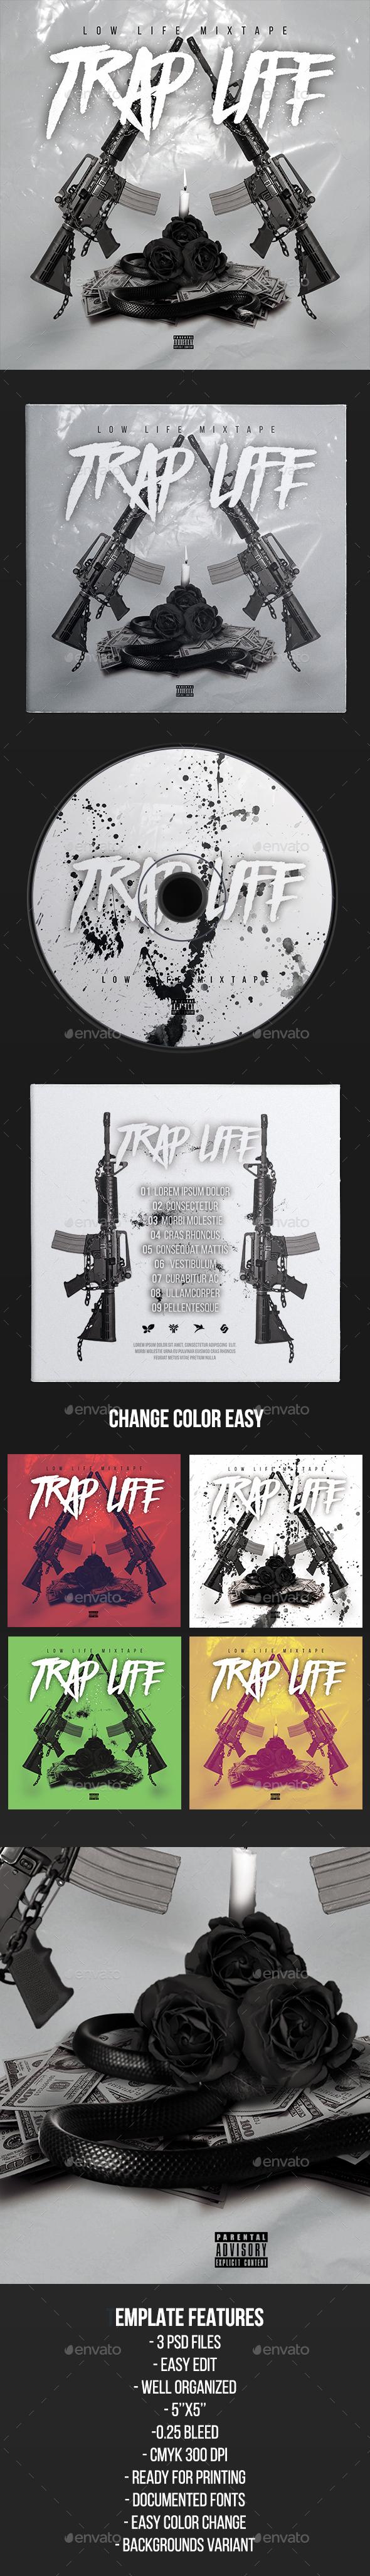 Trap Life - CD Cover Artwork Template - CD & DVD Artwork Print Templates